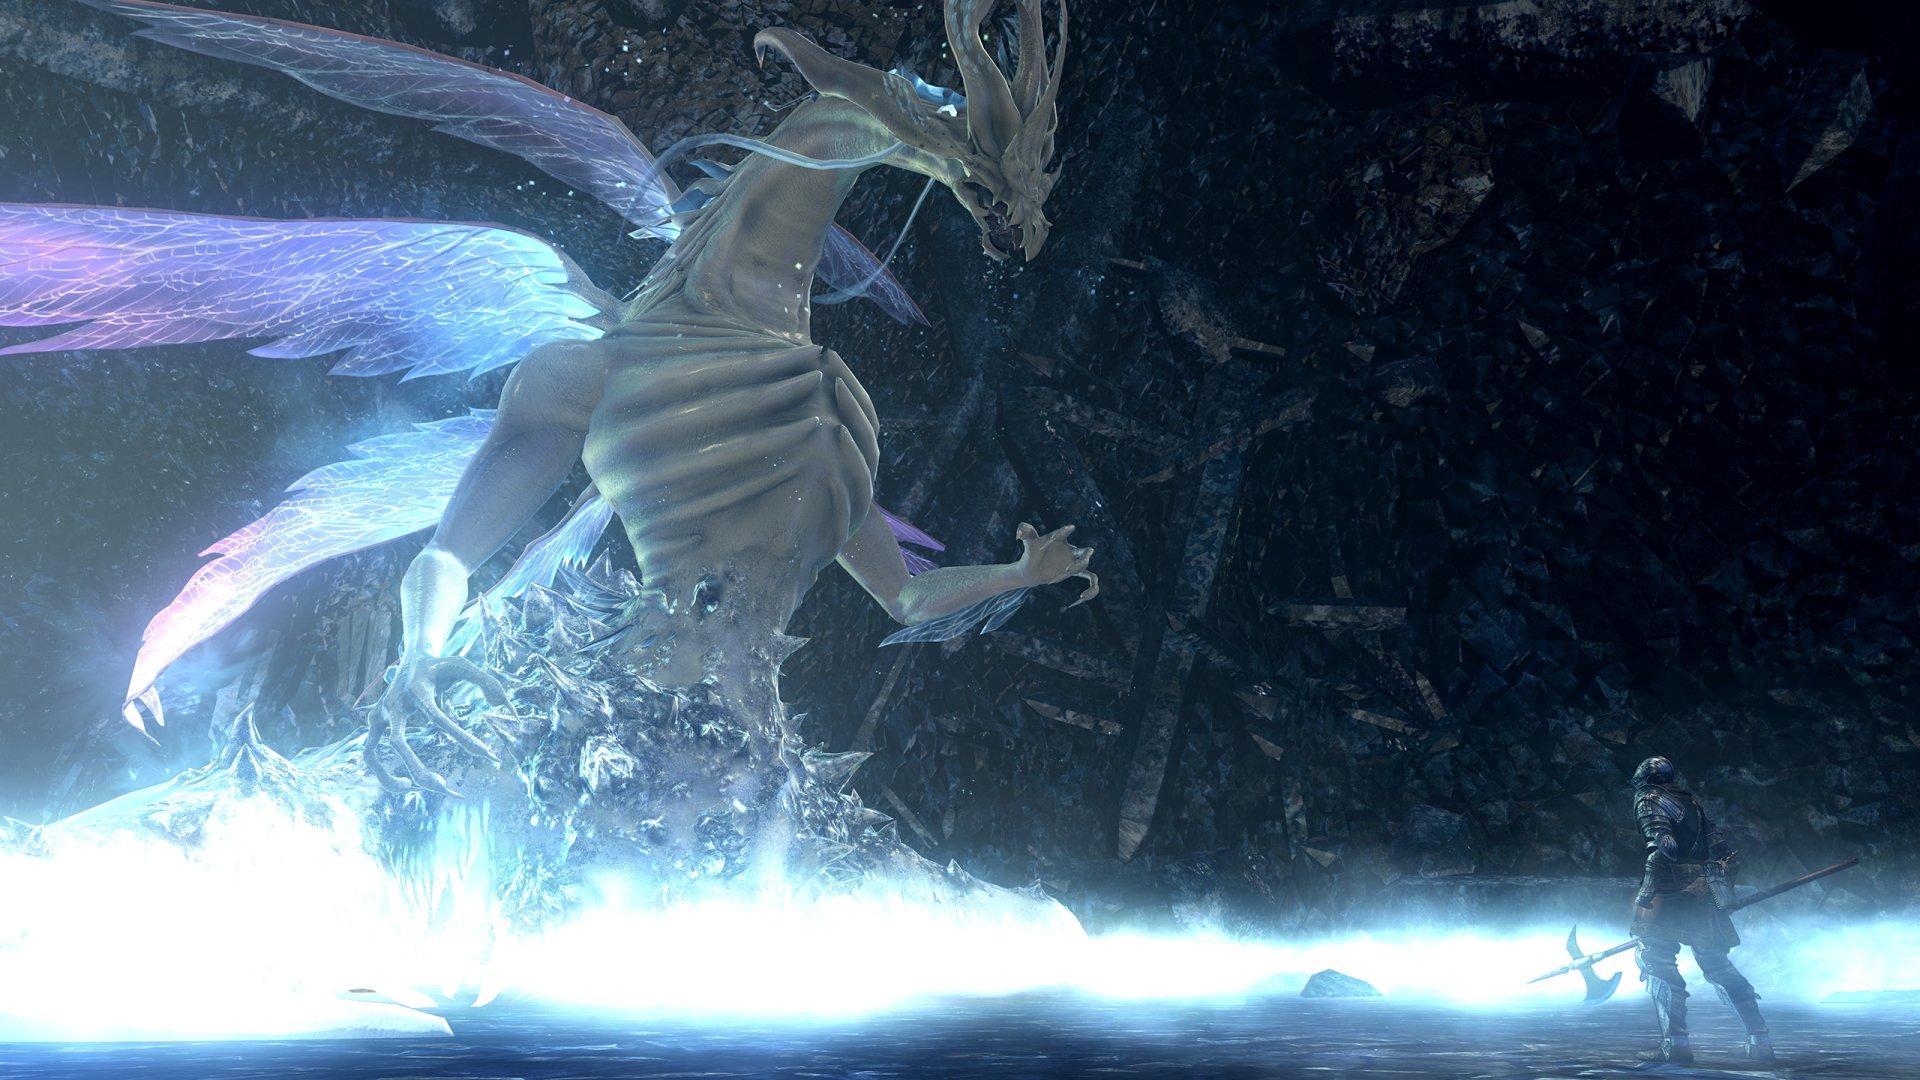 Dark Souls Hd Wallpaper Background Image 2560x1440